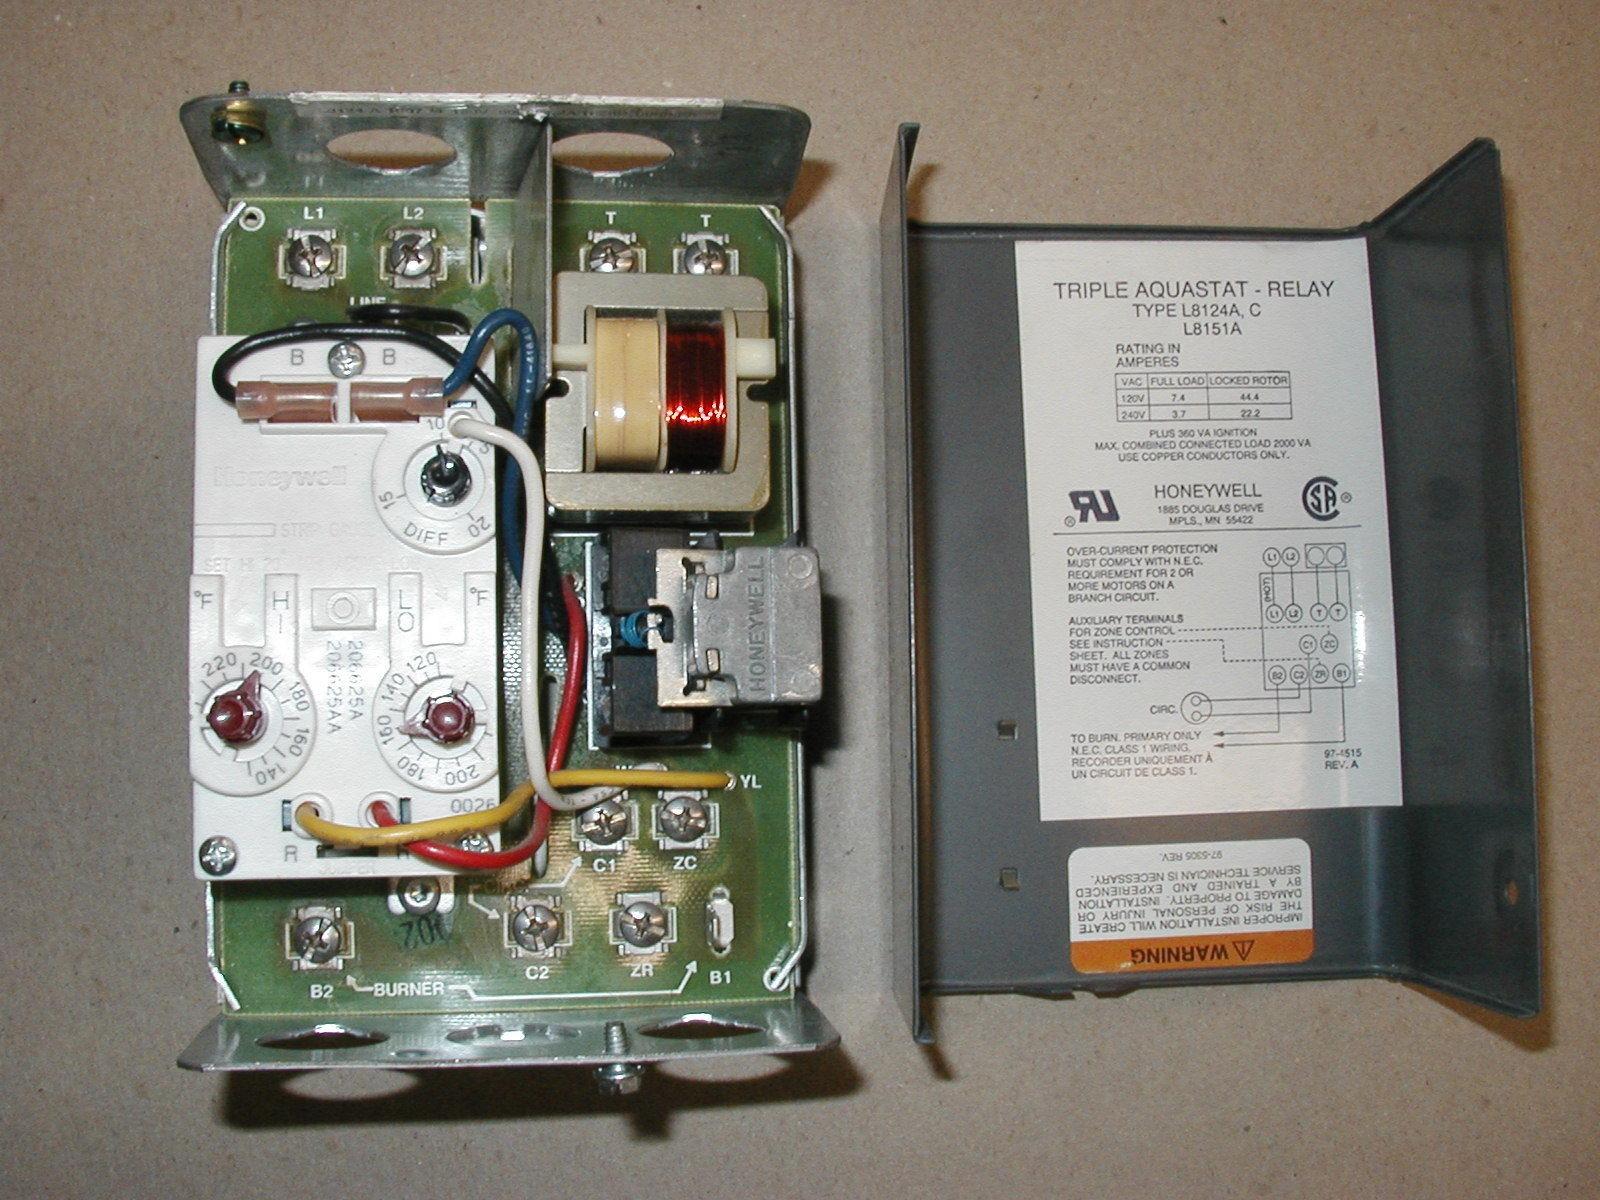 Triple Aquastat Relay Type L8124a C Honeywell Boiler Wiring Diagram Inspirational Image Rh Mainetreasurechest Com